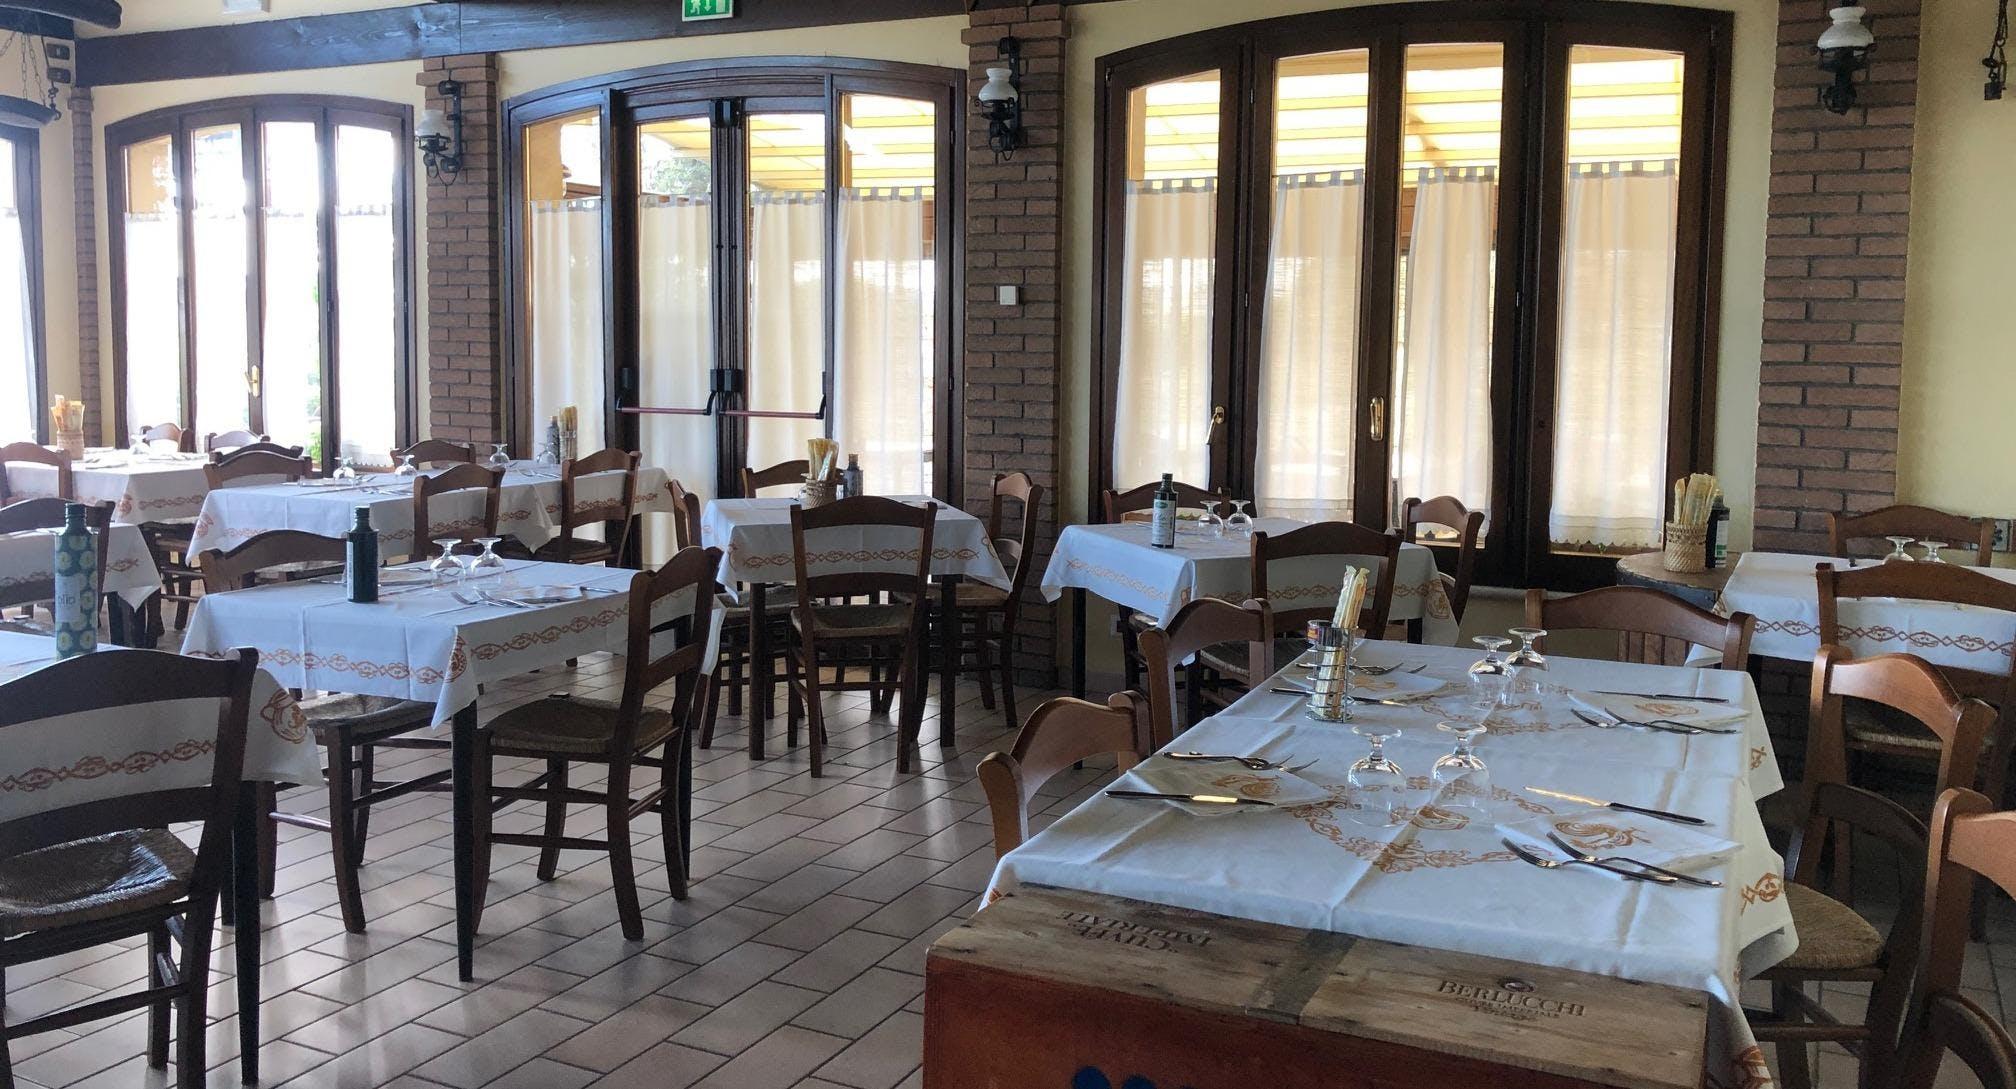 La Greppia Rimini image 2